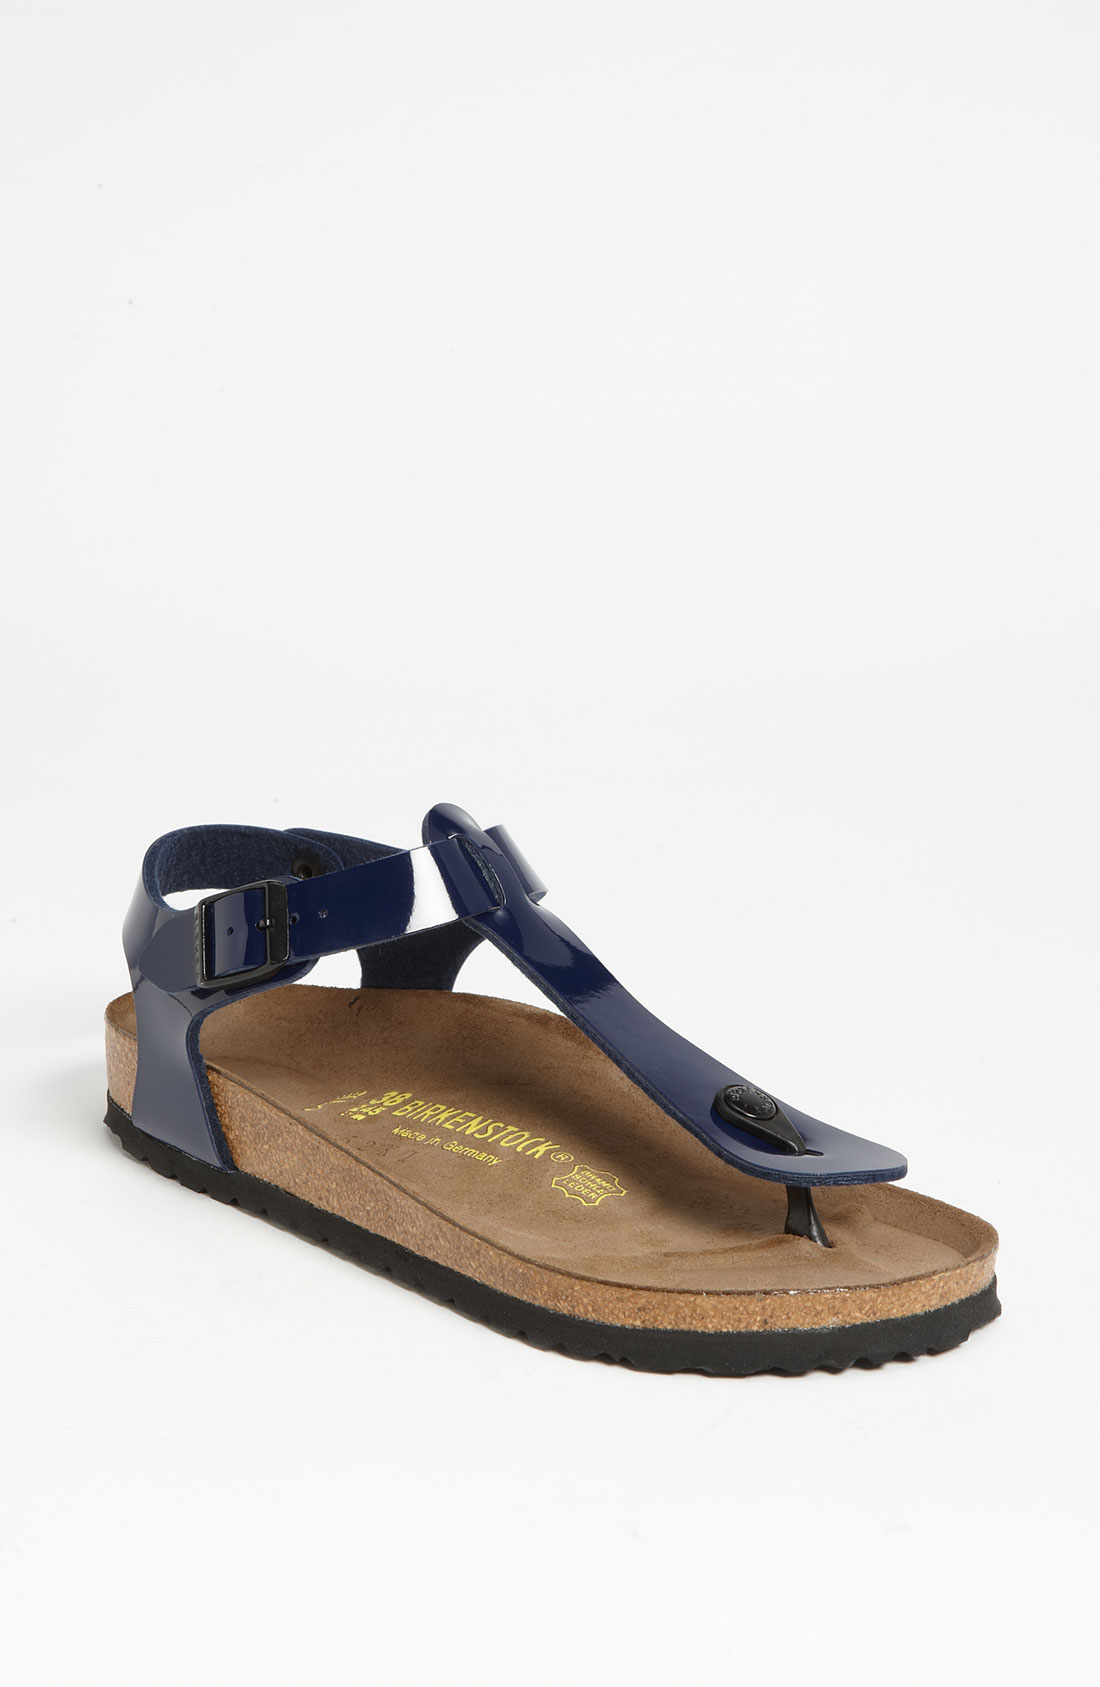 Birkenstock Kairo Sandal In Blue Dress Blue Patent Lyst